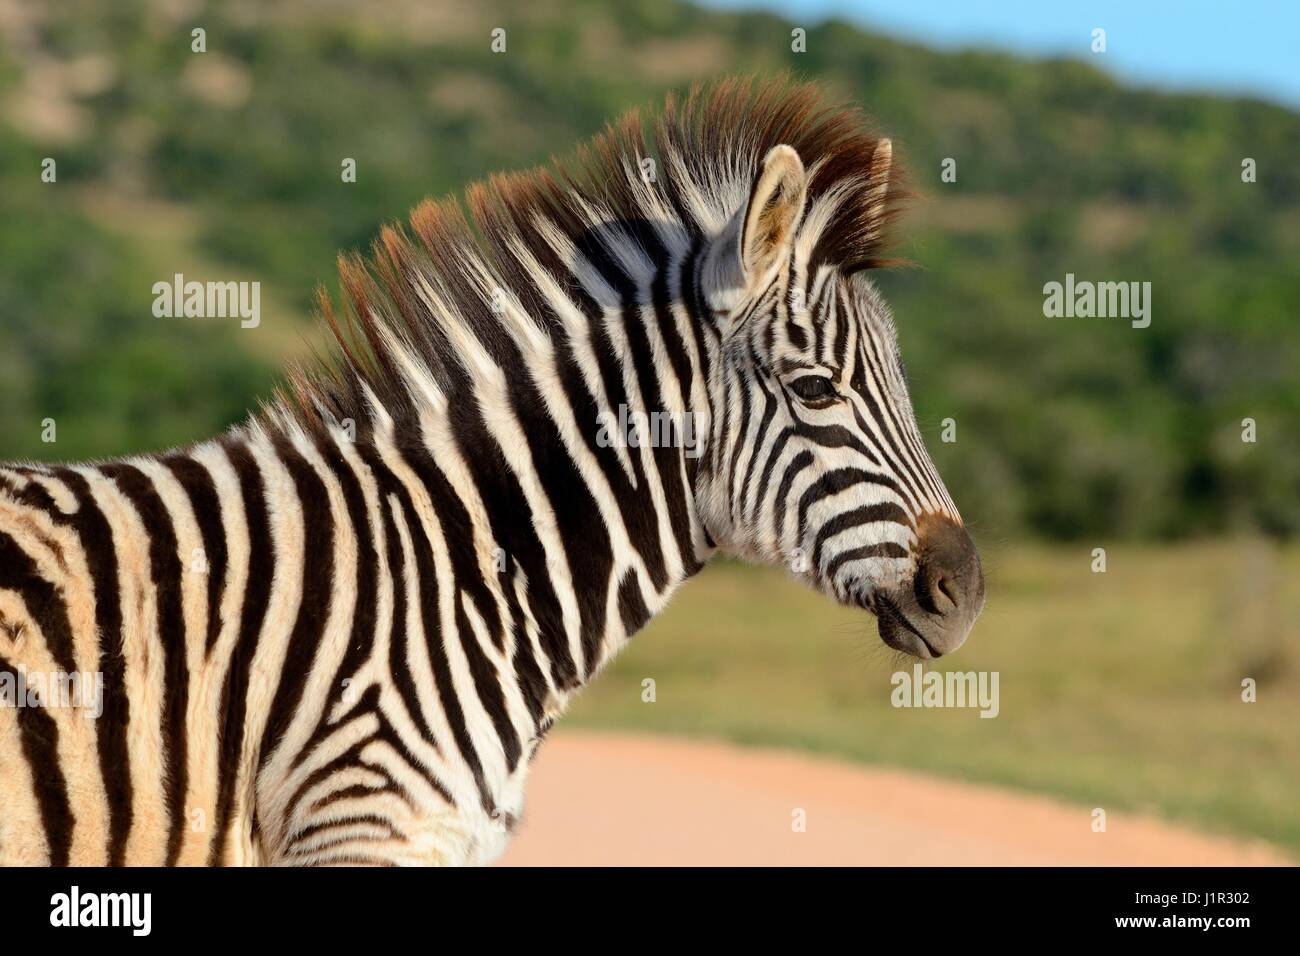 Young Burchell's zebra (Equus quagga burchellii), on grassland, Addo Elephant National Park, Eastern Cape, South - Stock Image